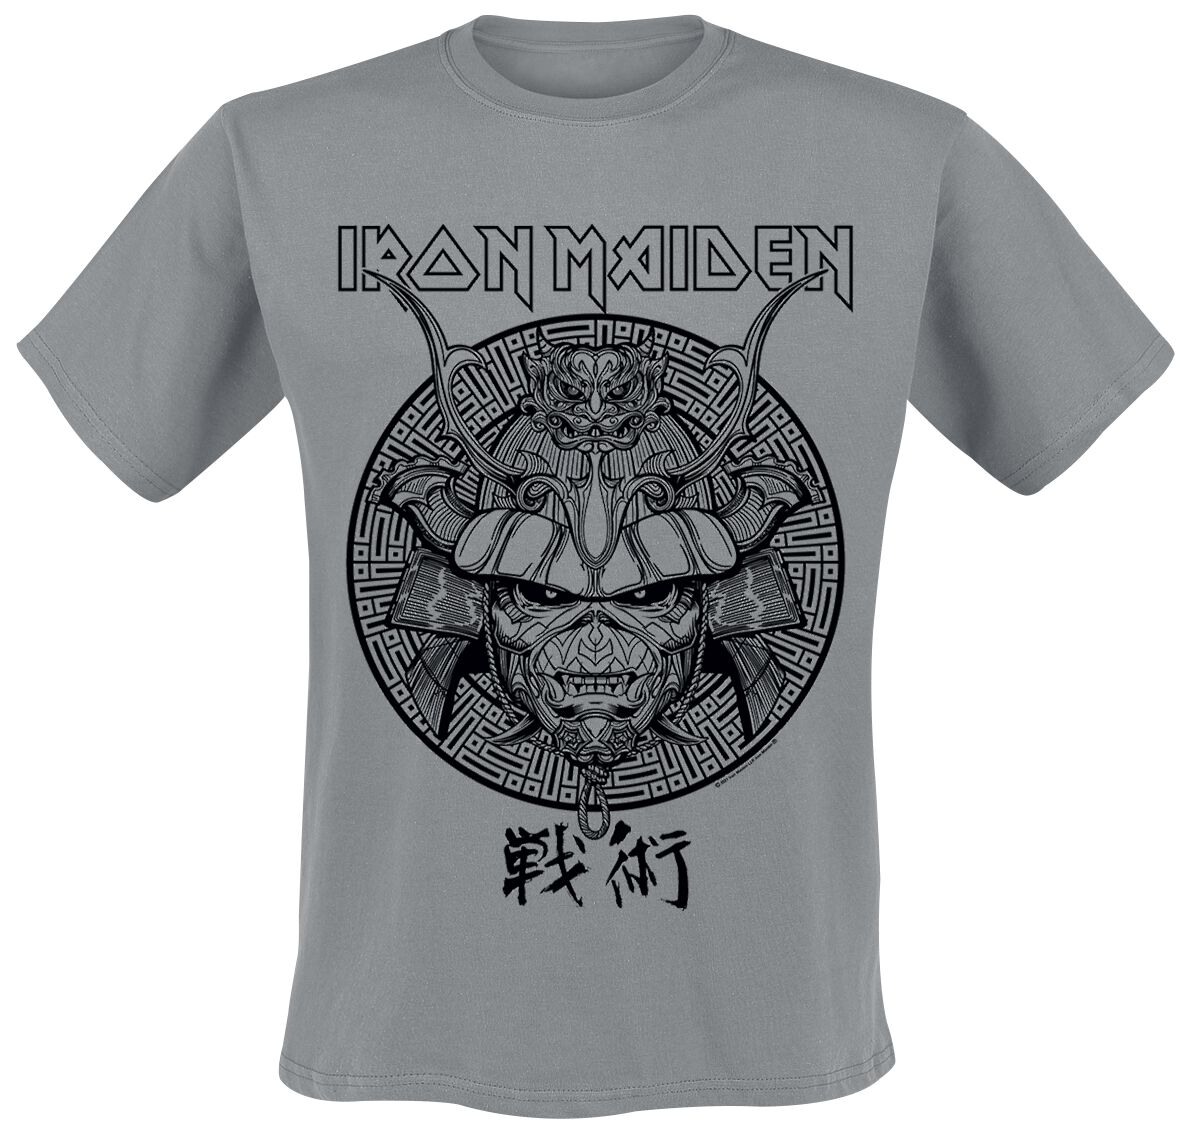 Iron Maiden - Senjutsu (2021) - Página 12 512012a